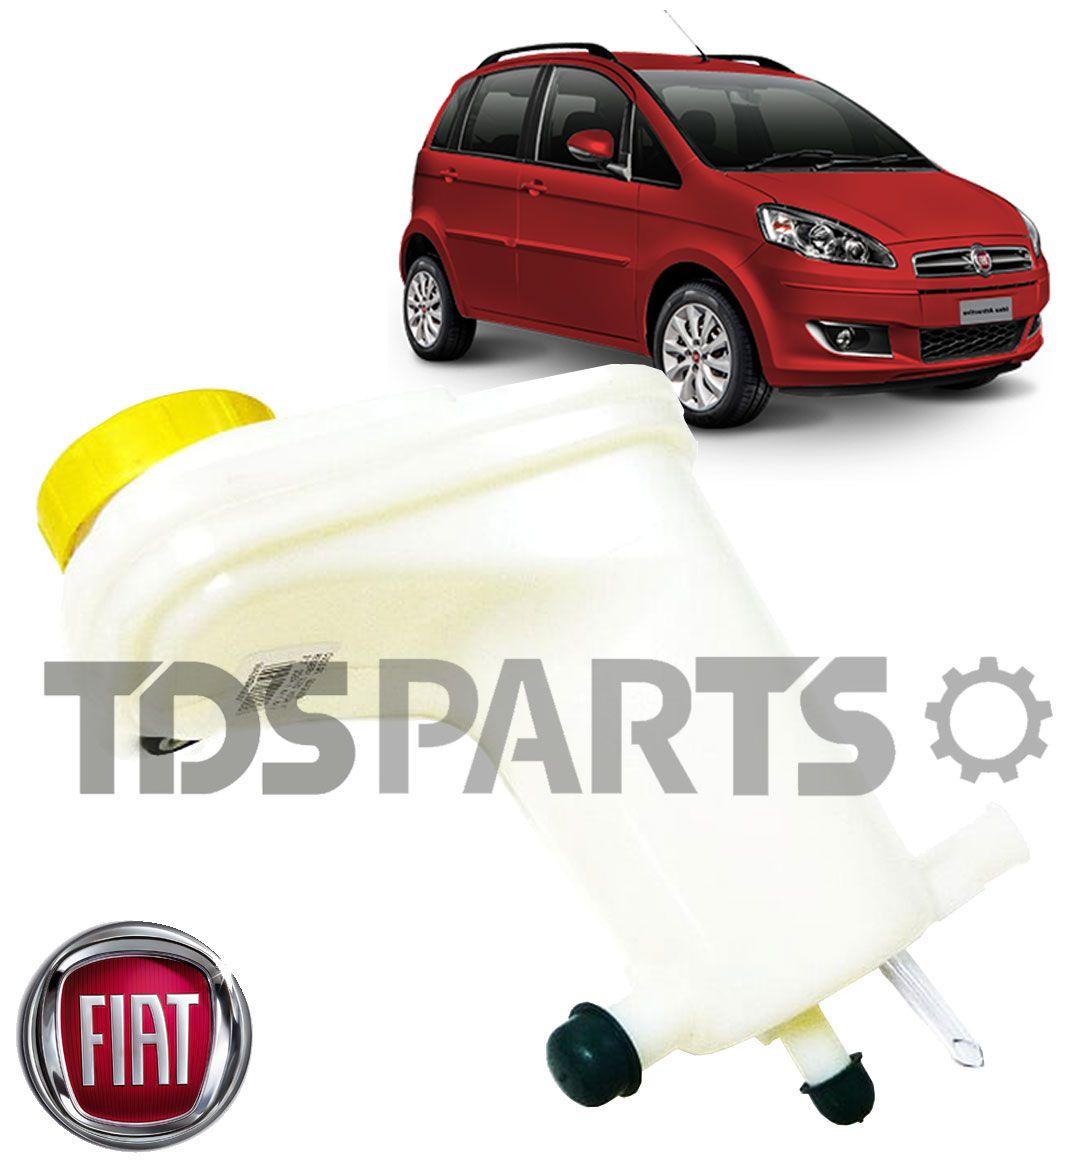 Reservatório De Óleo Hidráulico Fiat Idea 1.4 / 1.6 / 1.8